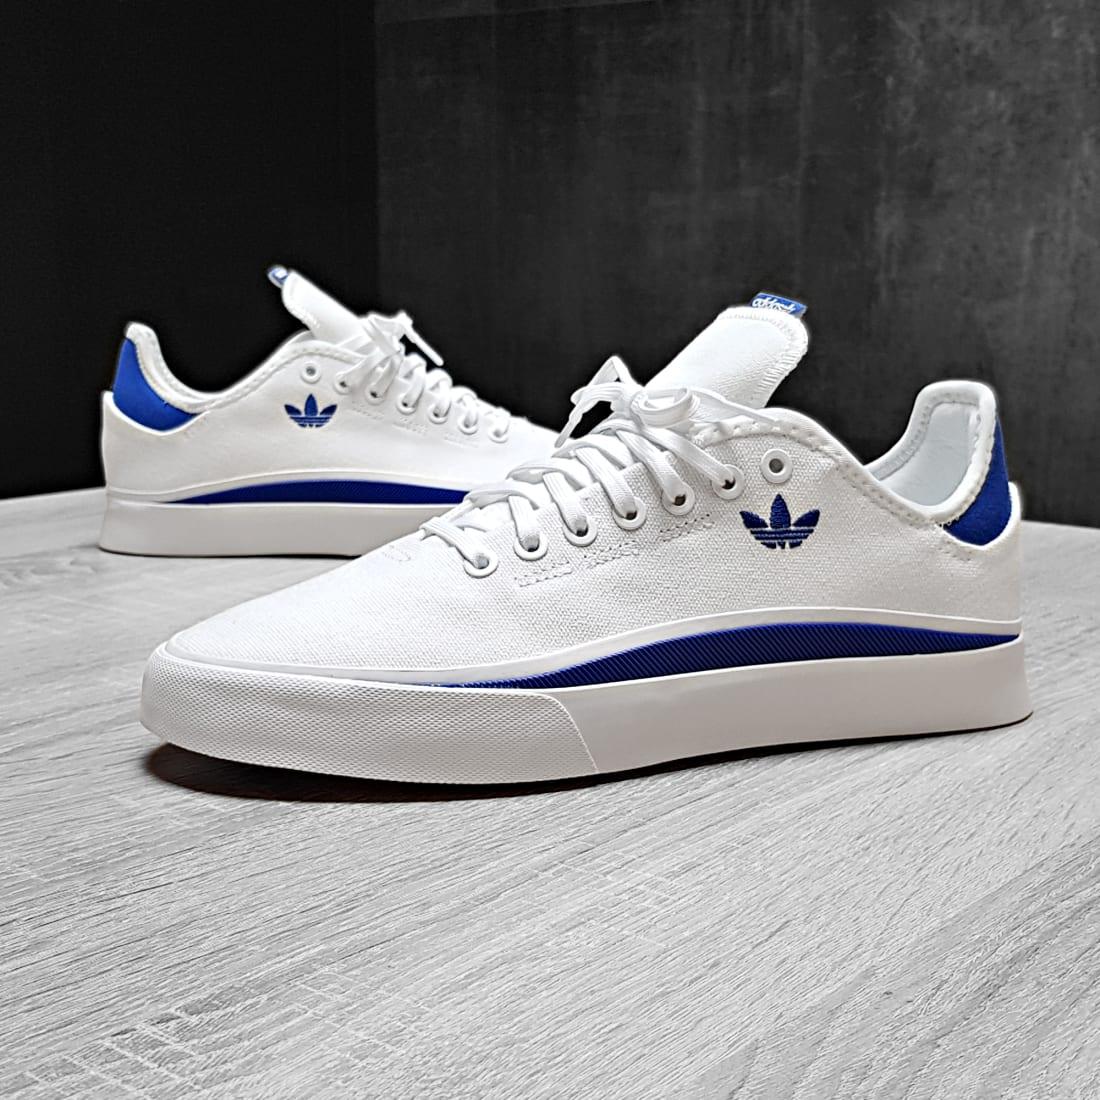 adidas - Baskets Sabalo FV0689 Footwear White Royal Blue ...